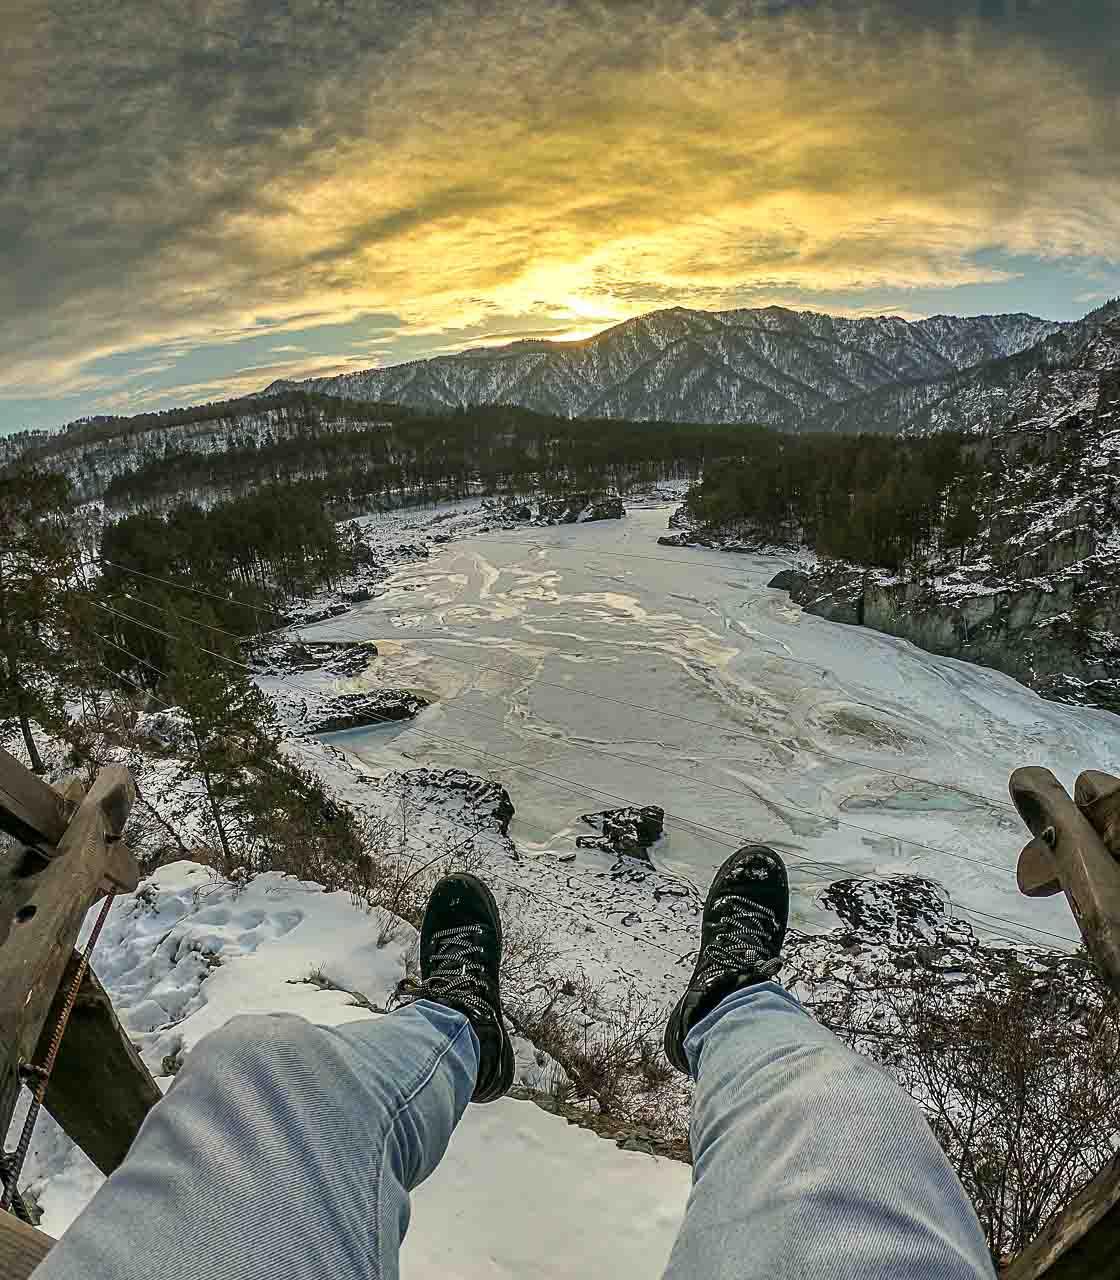 10 Reasons to Travel to Altai Mountains in Siberia [+20 Stunning Photos]